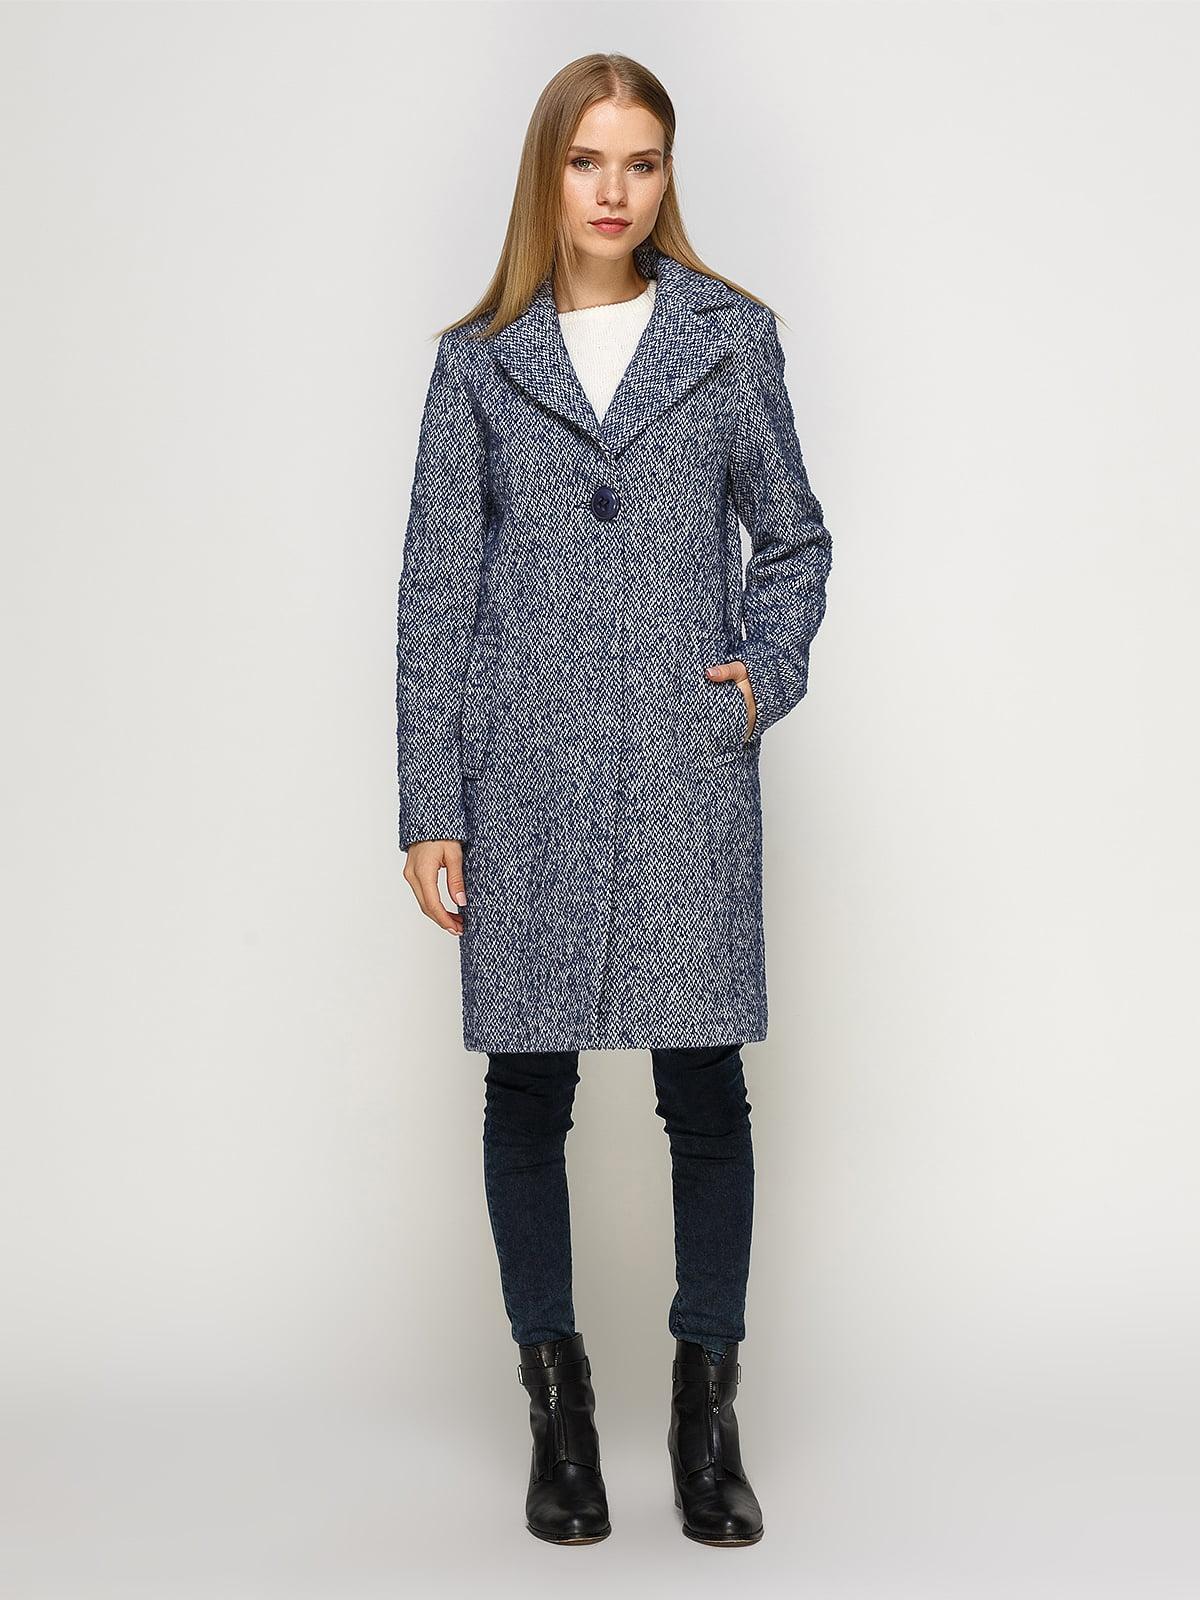 Пальто светло-синее | 4492631 | фото 2